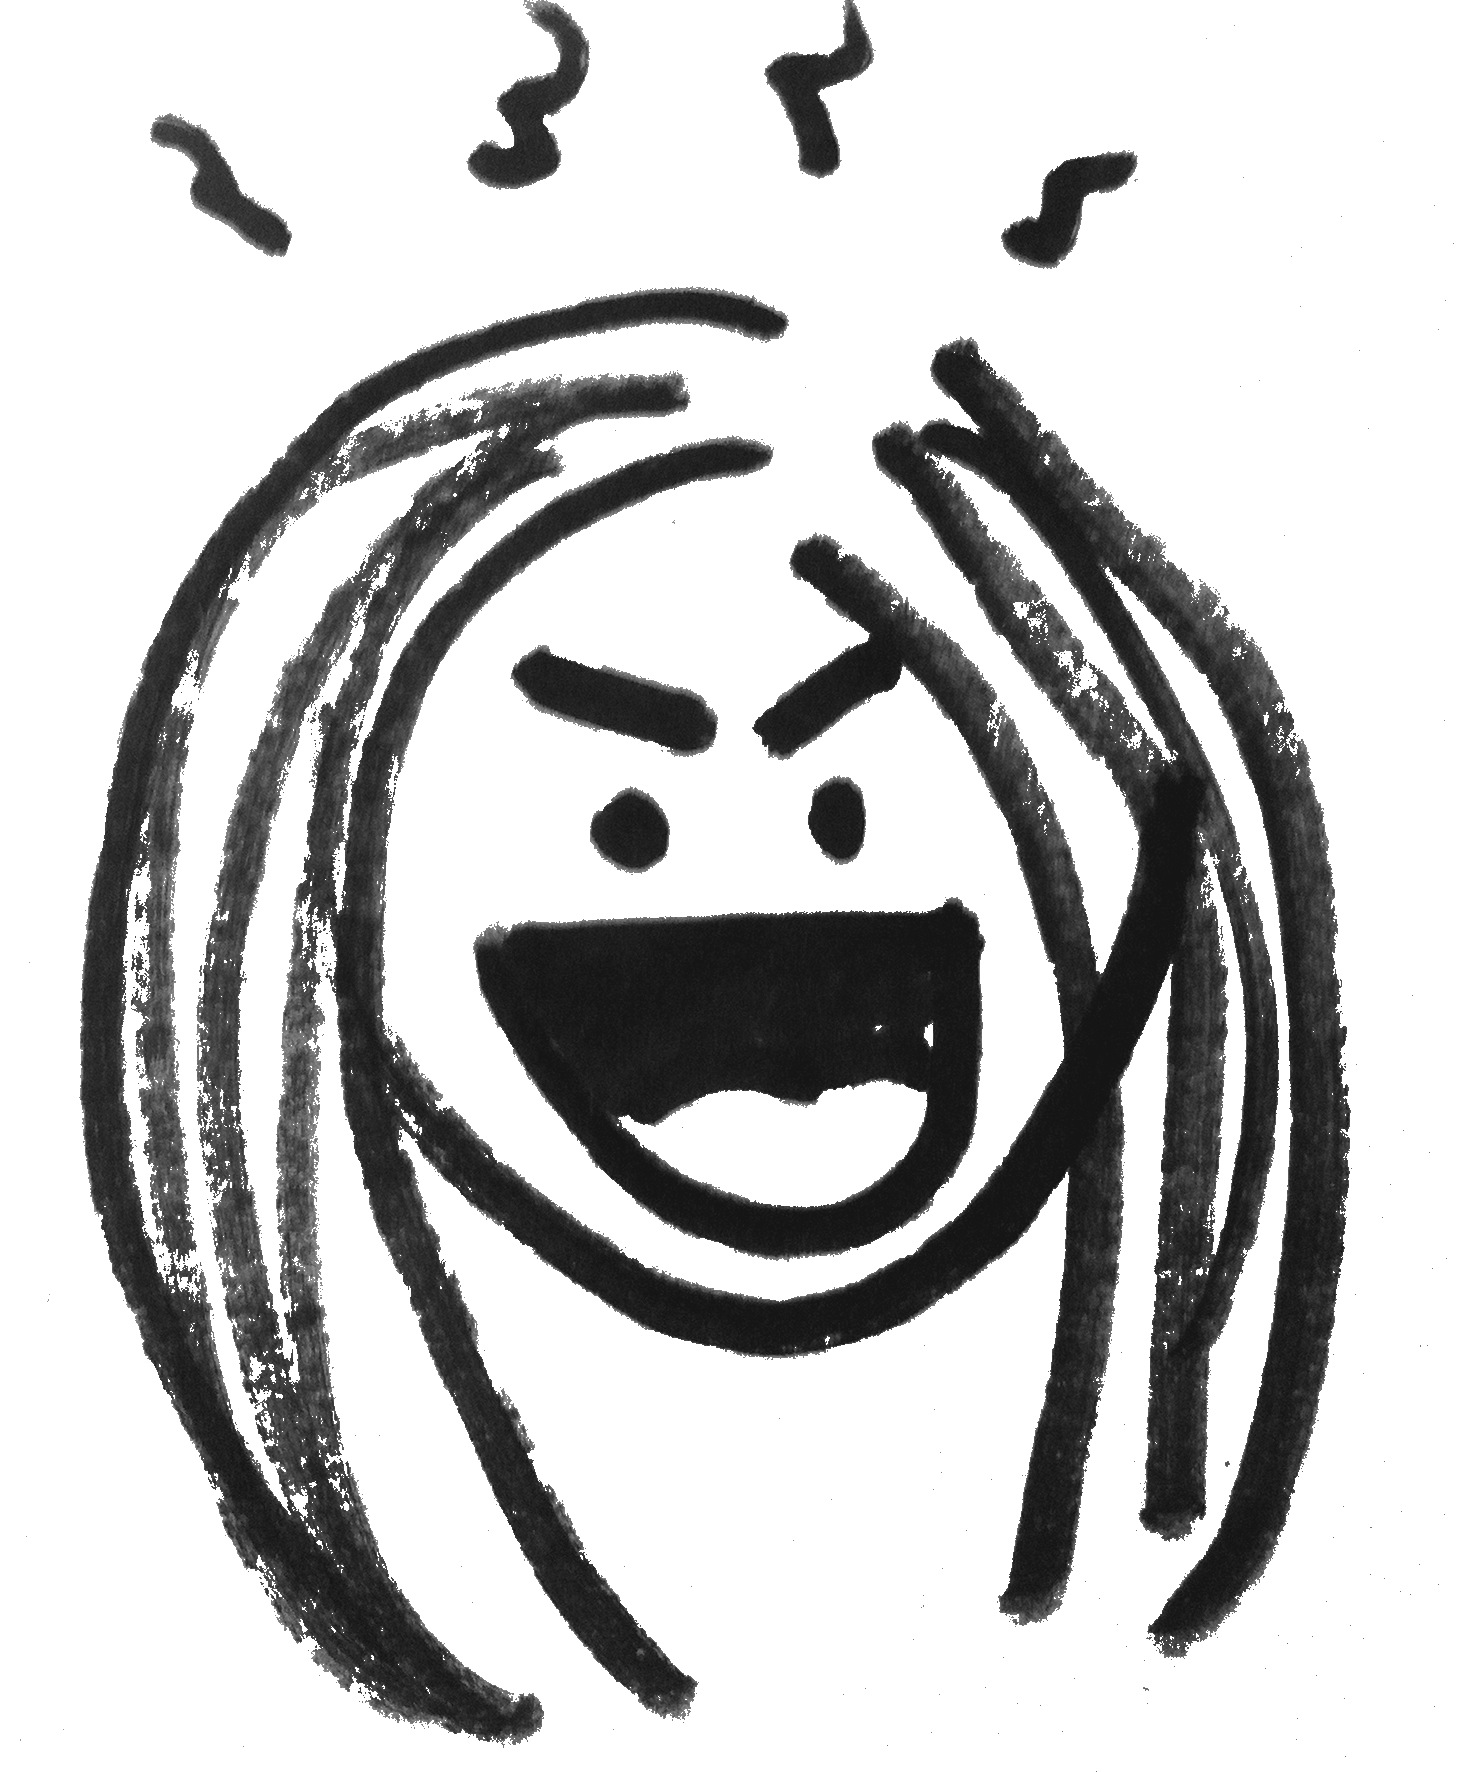 AAAUGH!!! Feel my doodle rage!